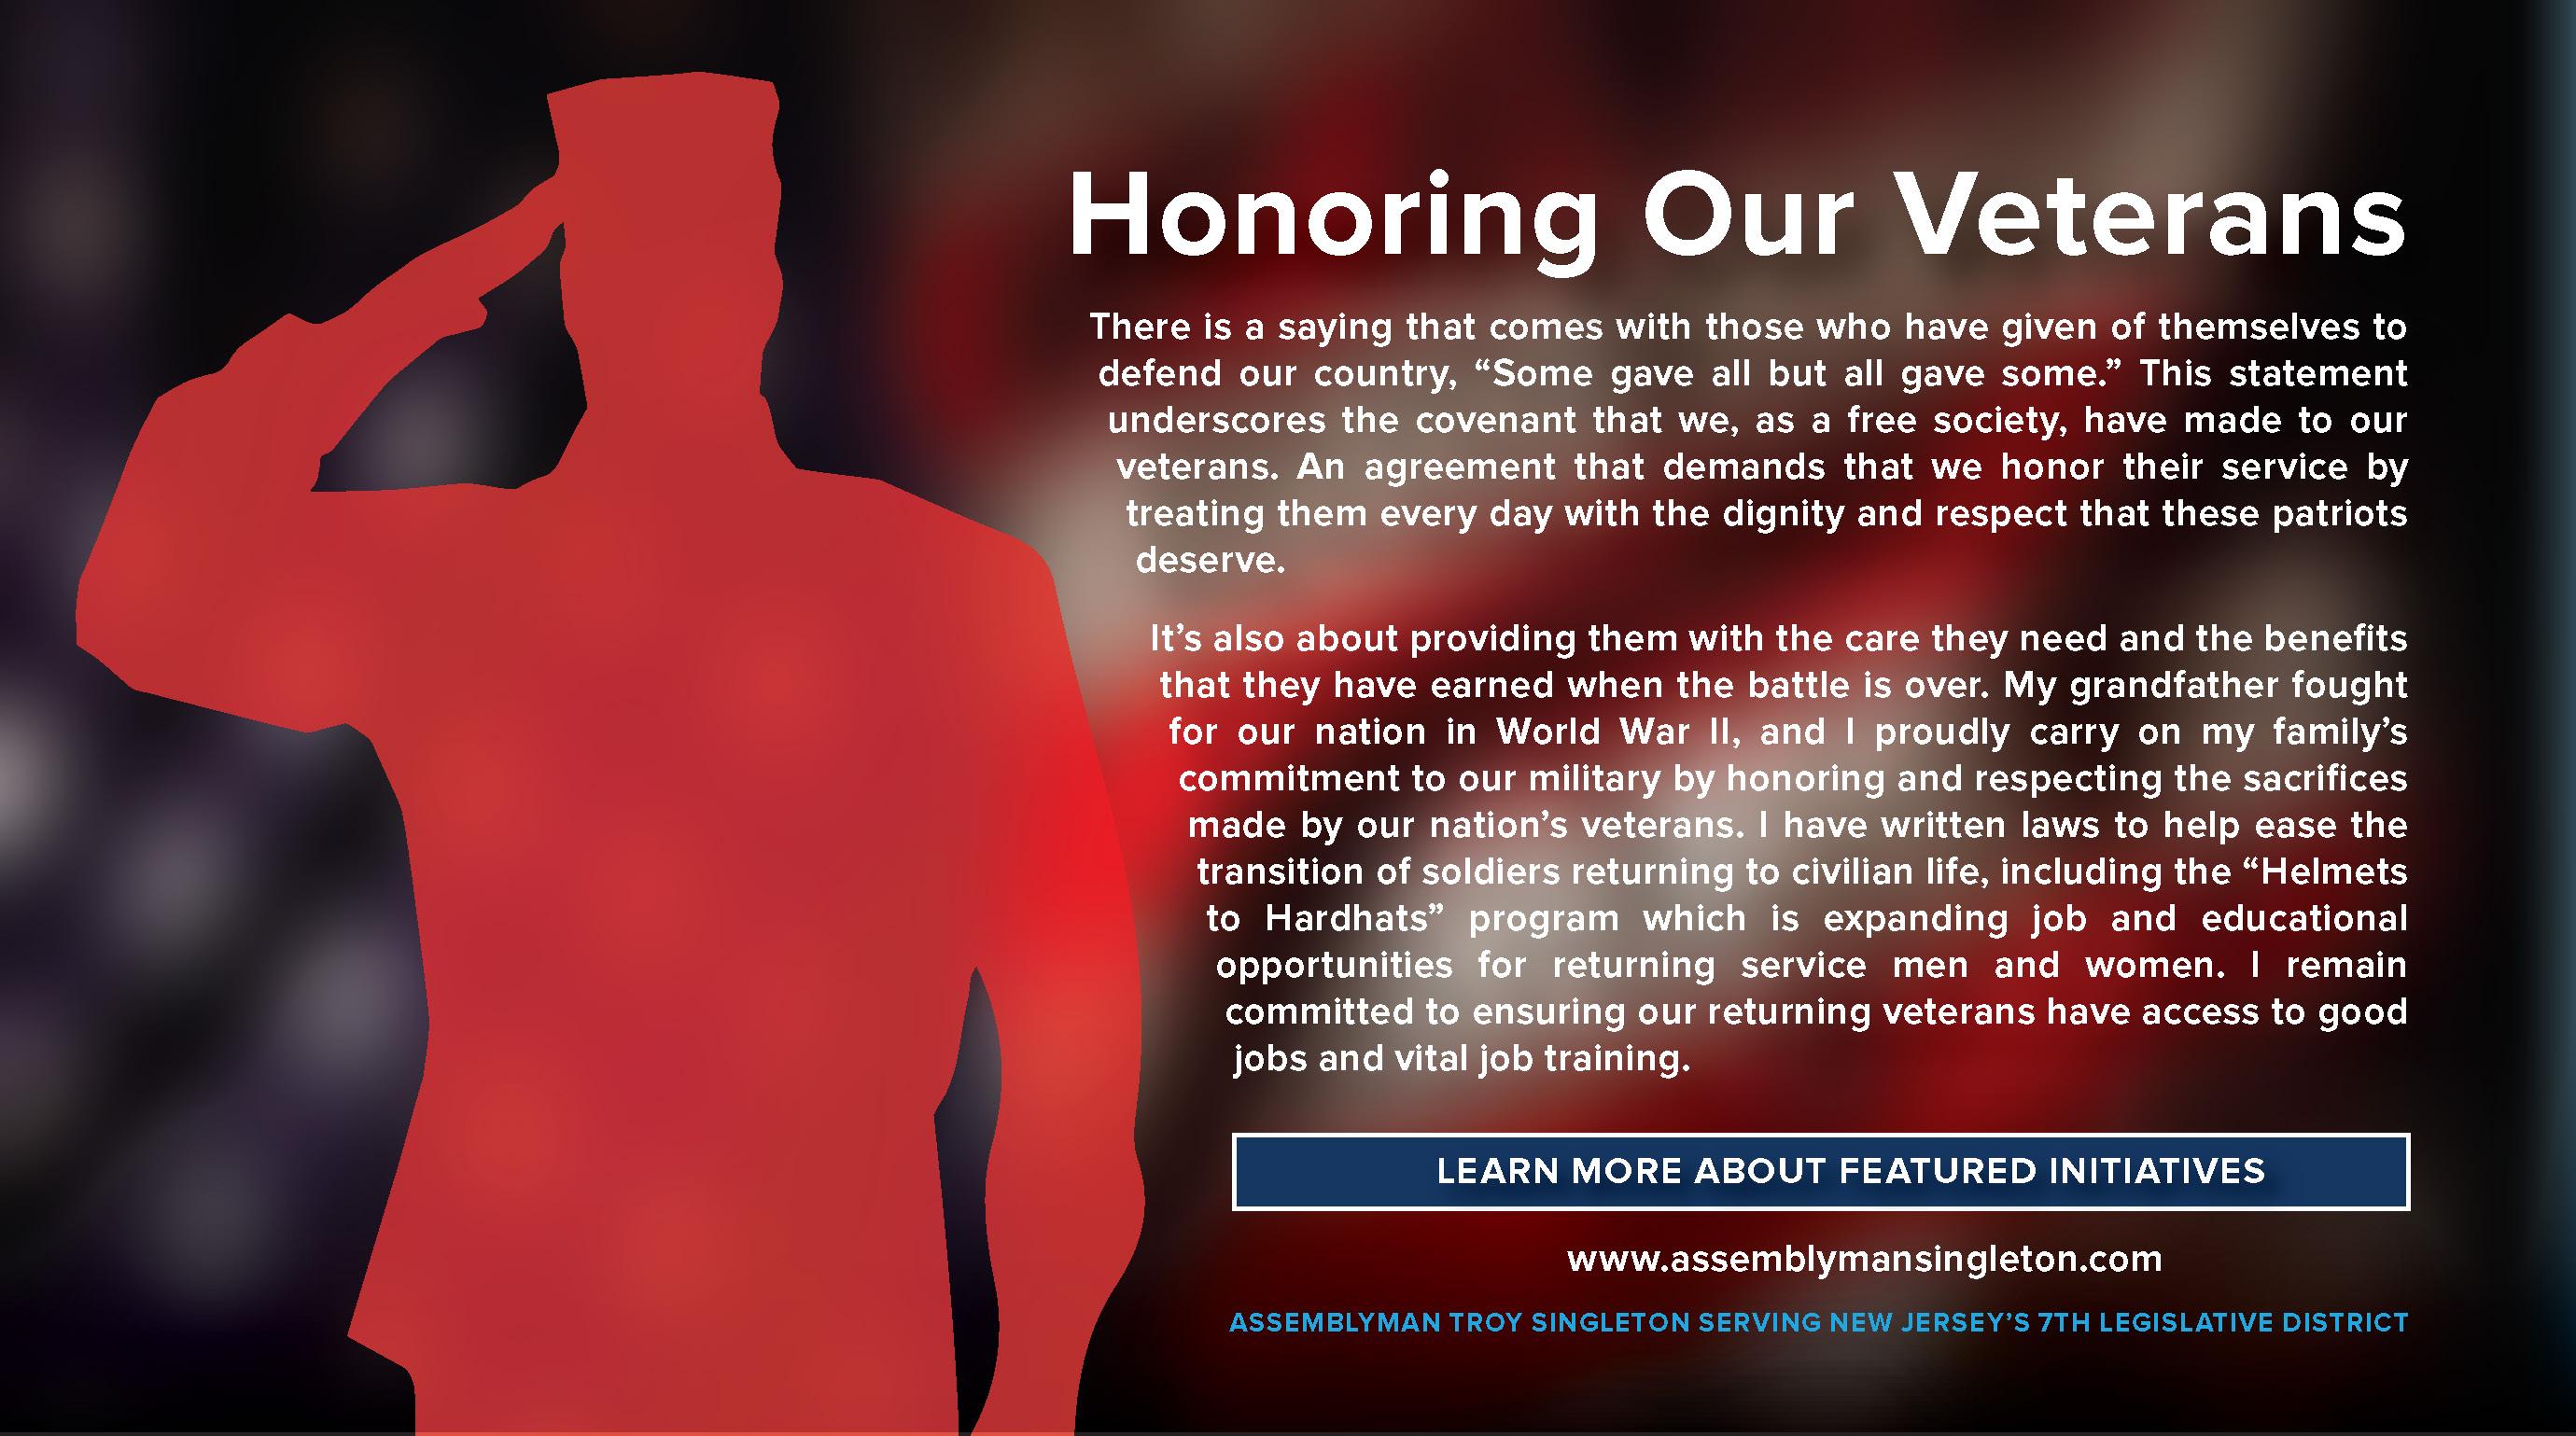 Singleton_Summer_Policy_Series_-_Veterans_Facebook_Image.jpg